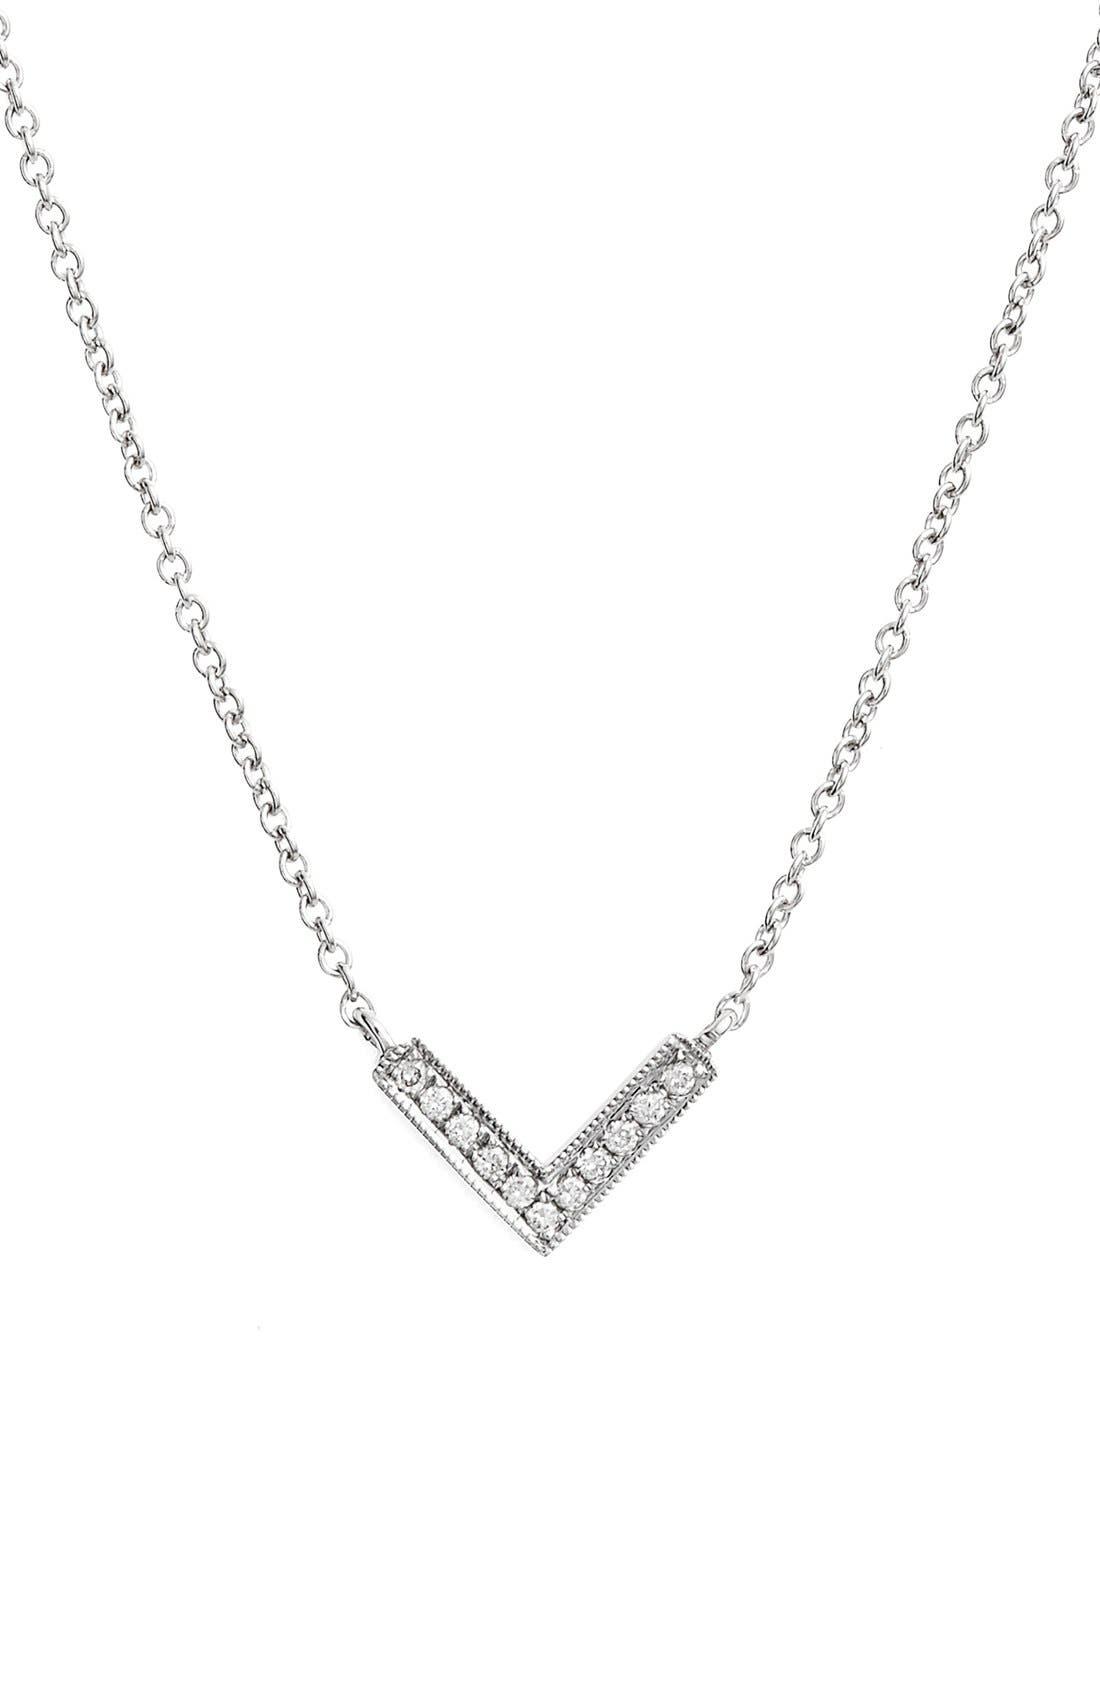 Dana Rebecca Designs 'Sylvie Rose' Diamond V Pendant Necklace